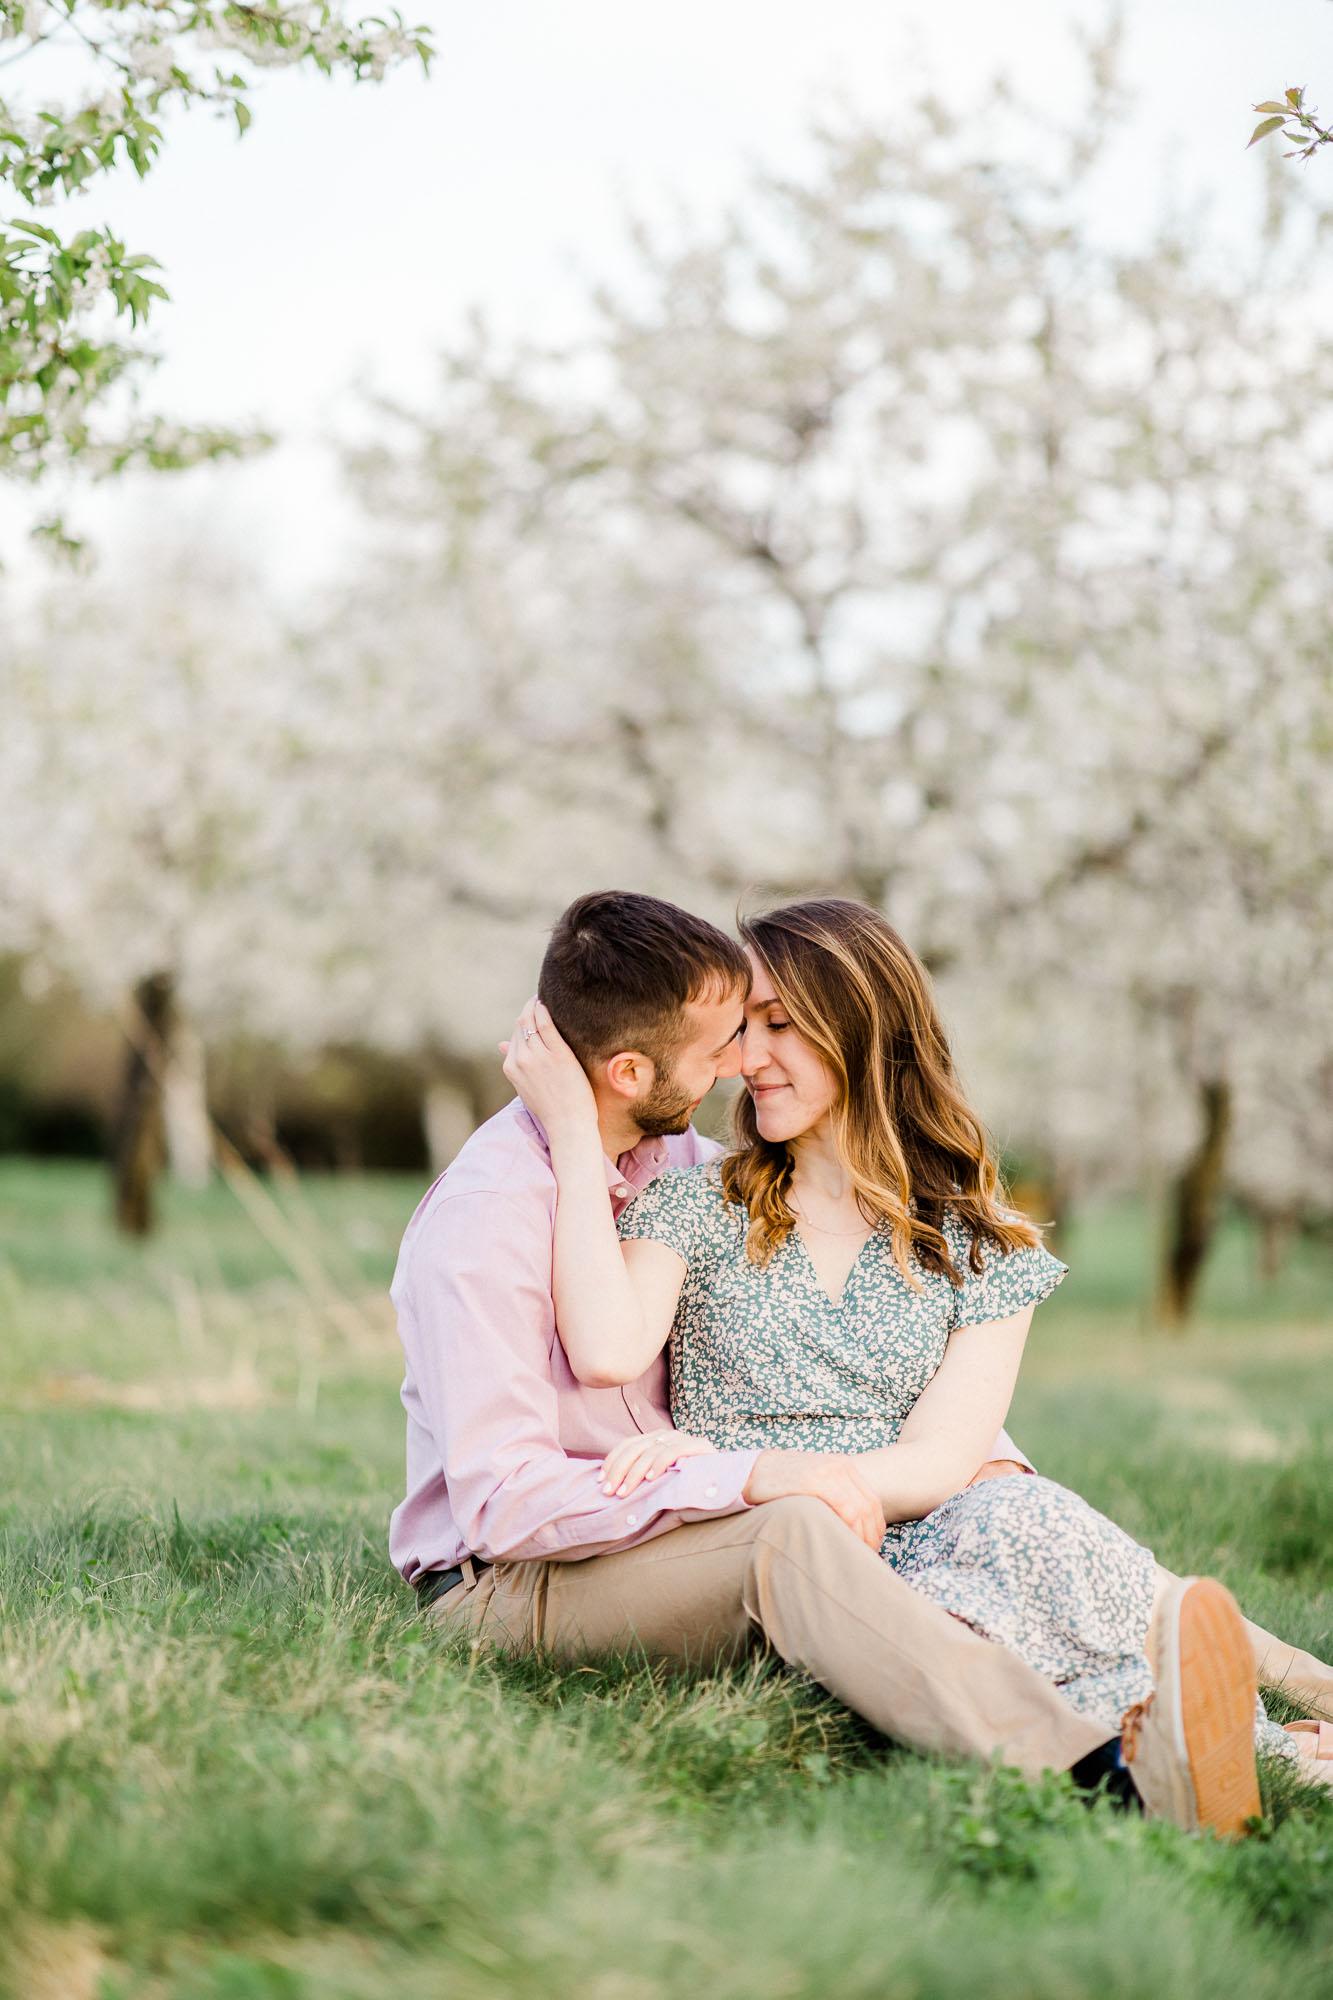 Rohrbachs-Spring-cherry-blossom-engagement-7756.jpg